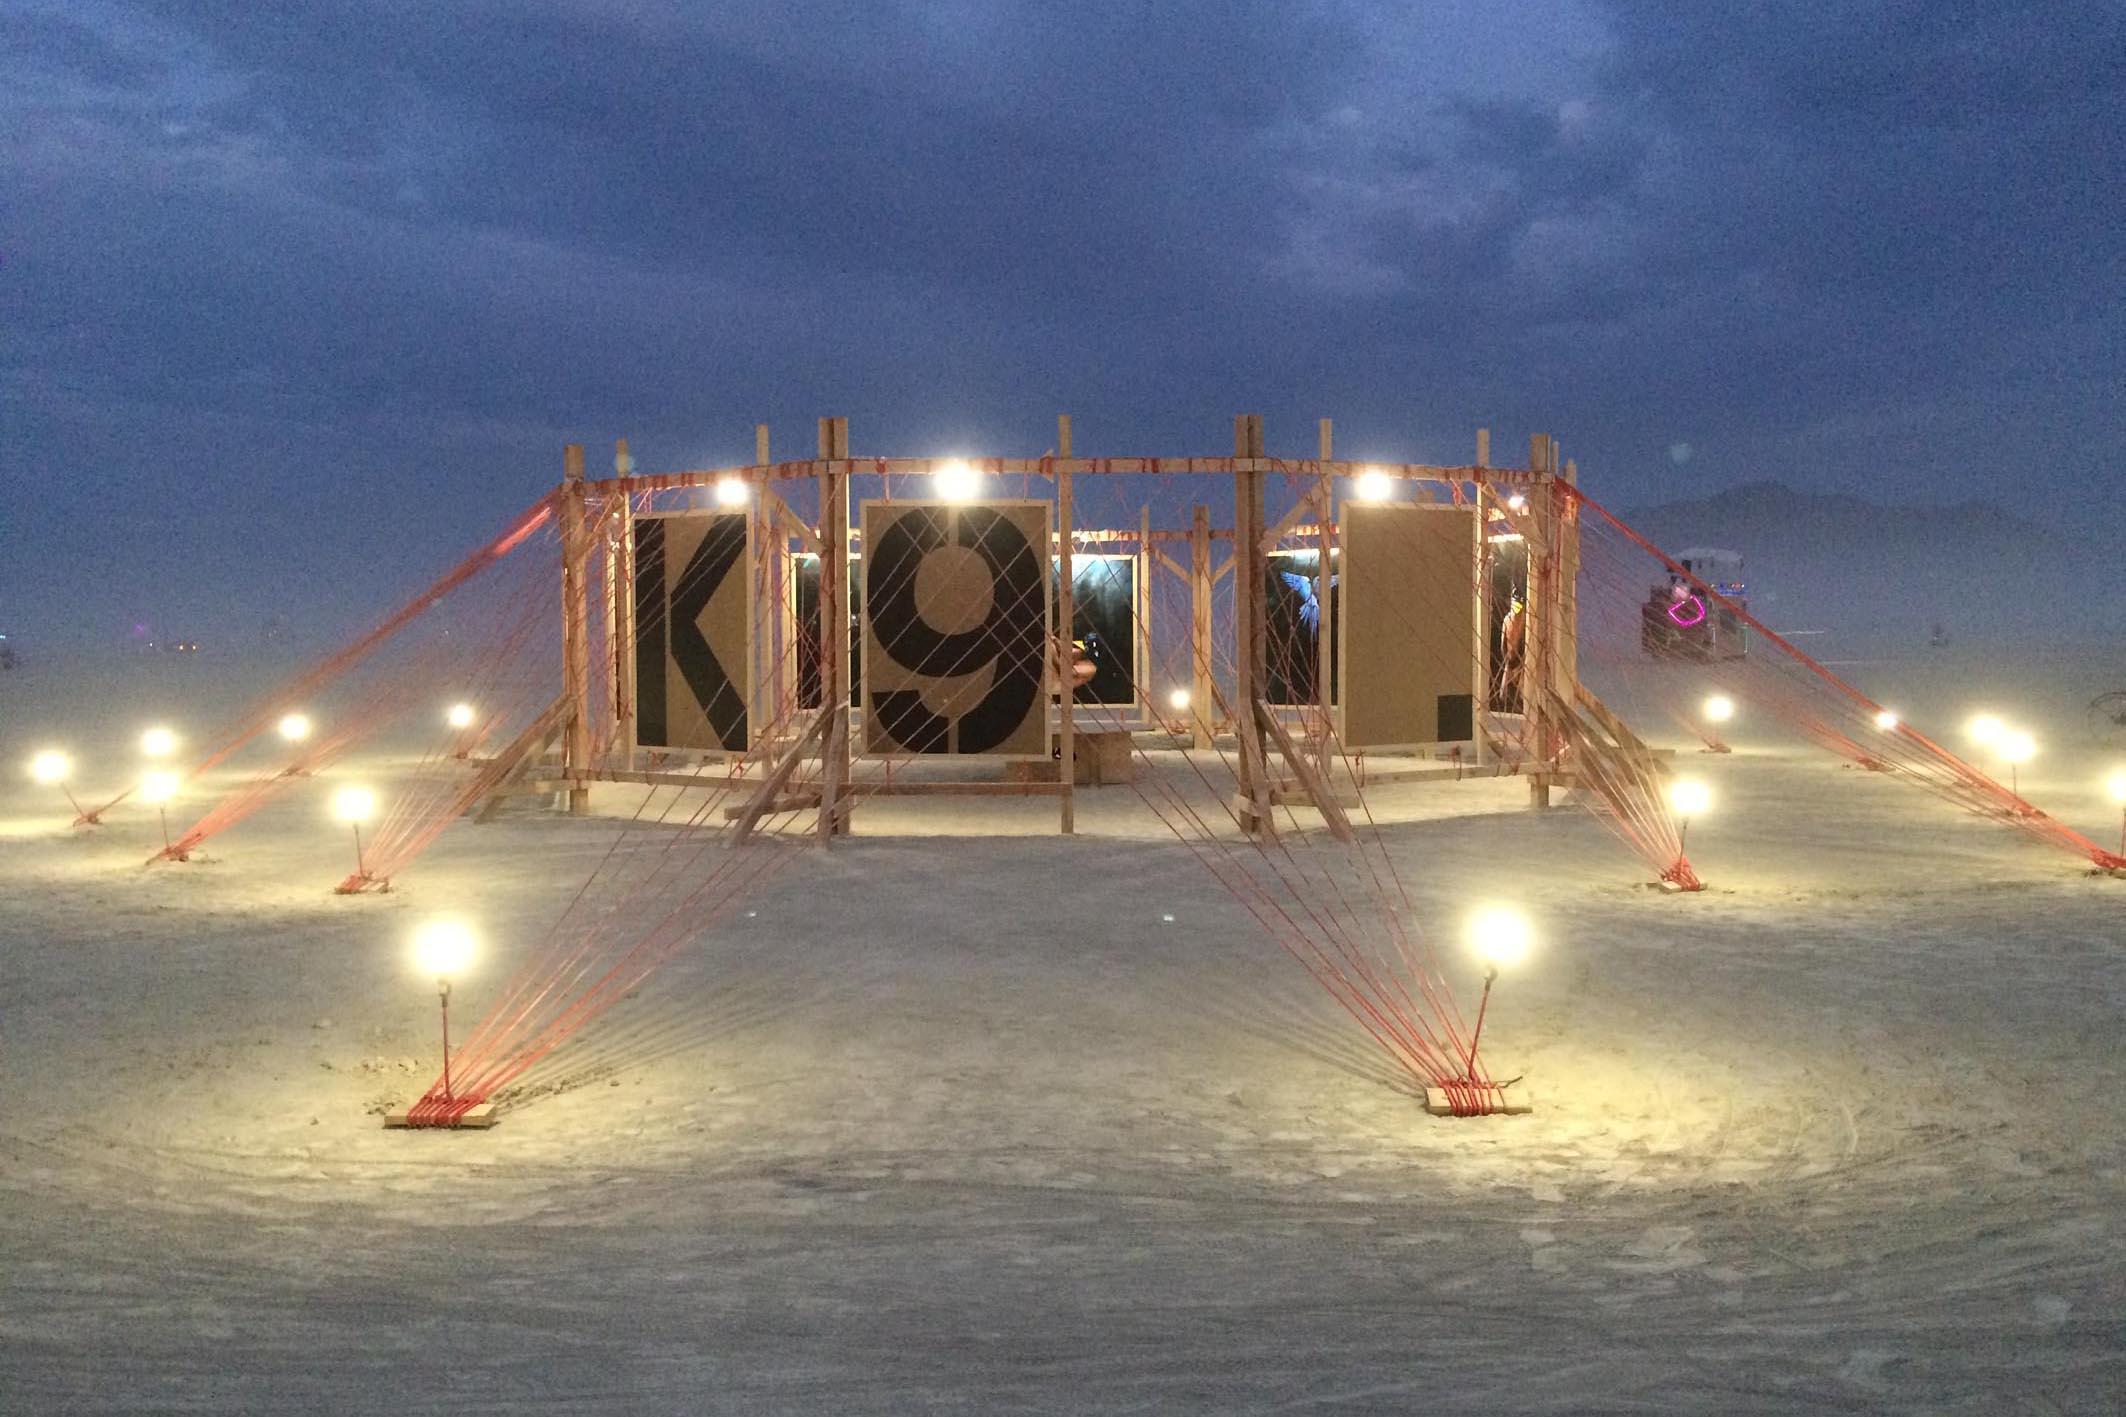 BurningMan 2017 Radical Rituals Art Project Installation 11